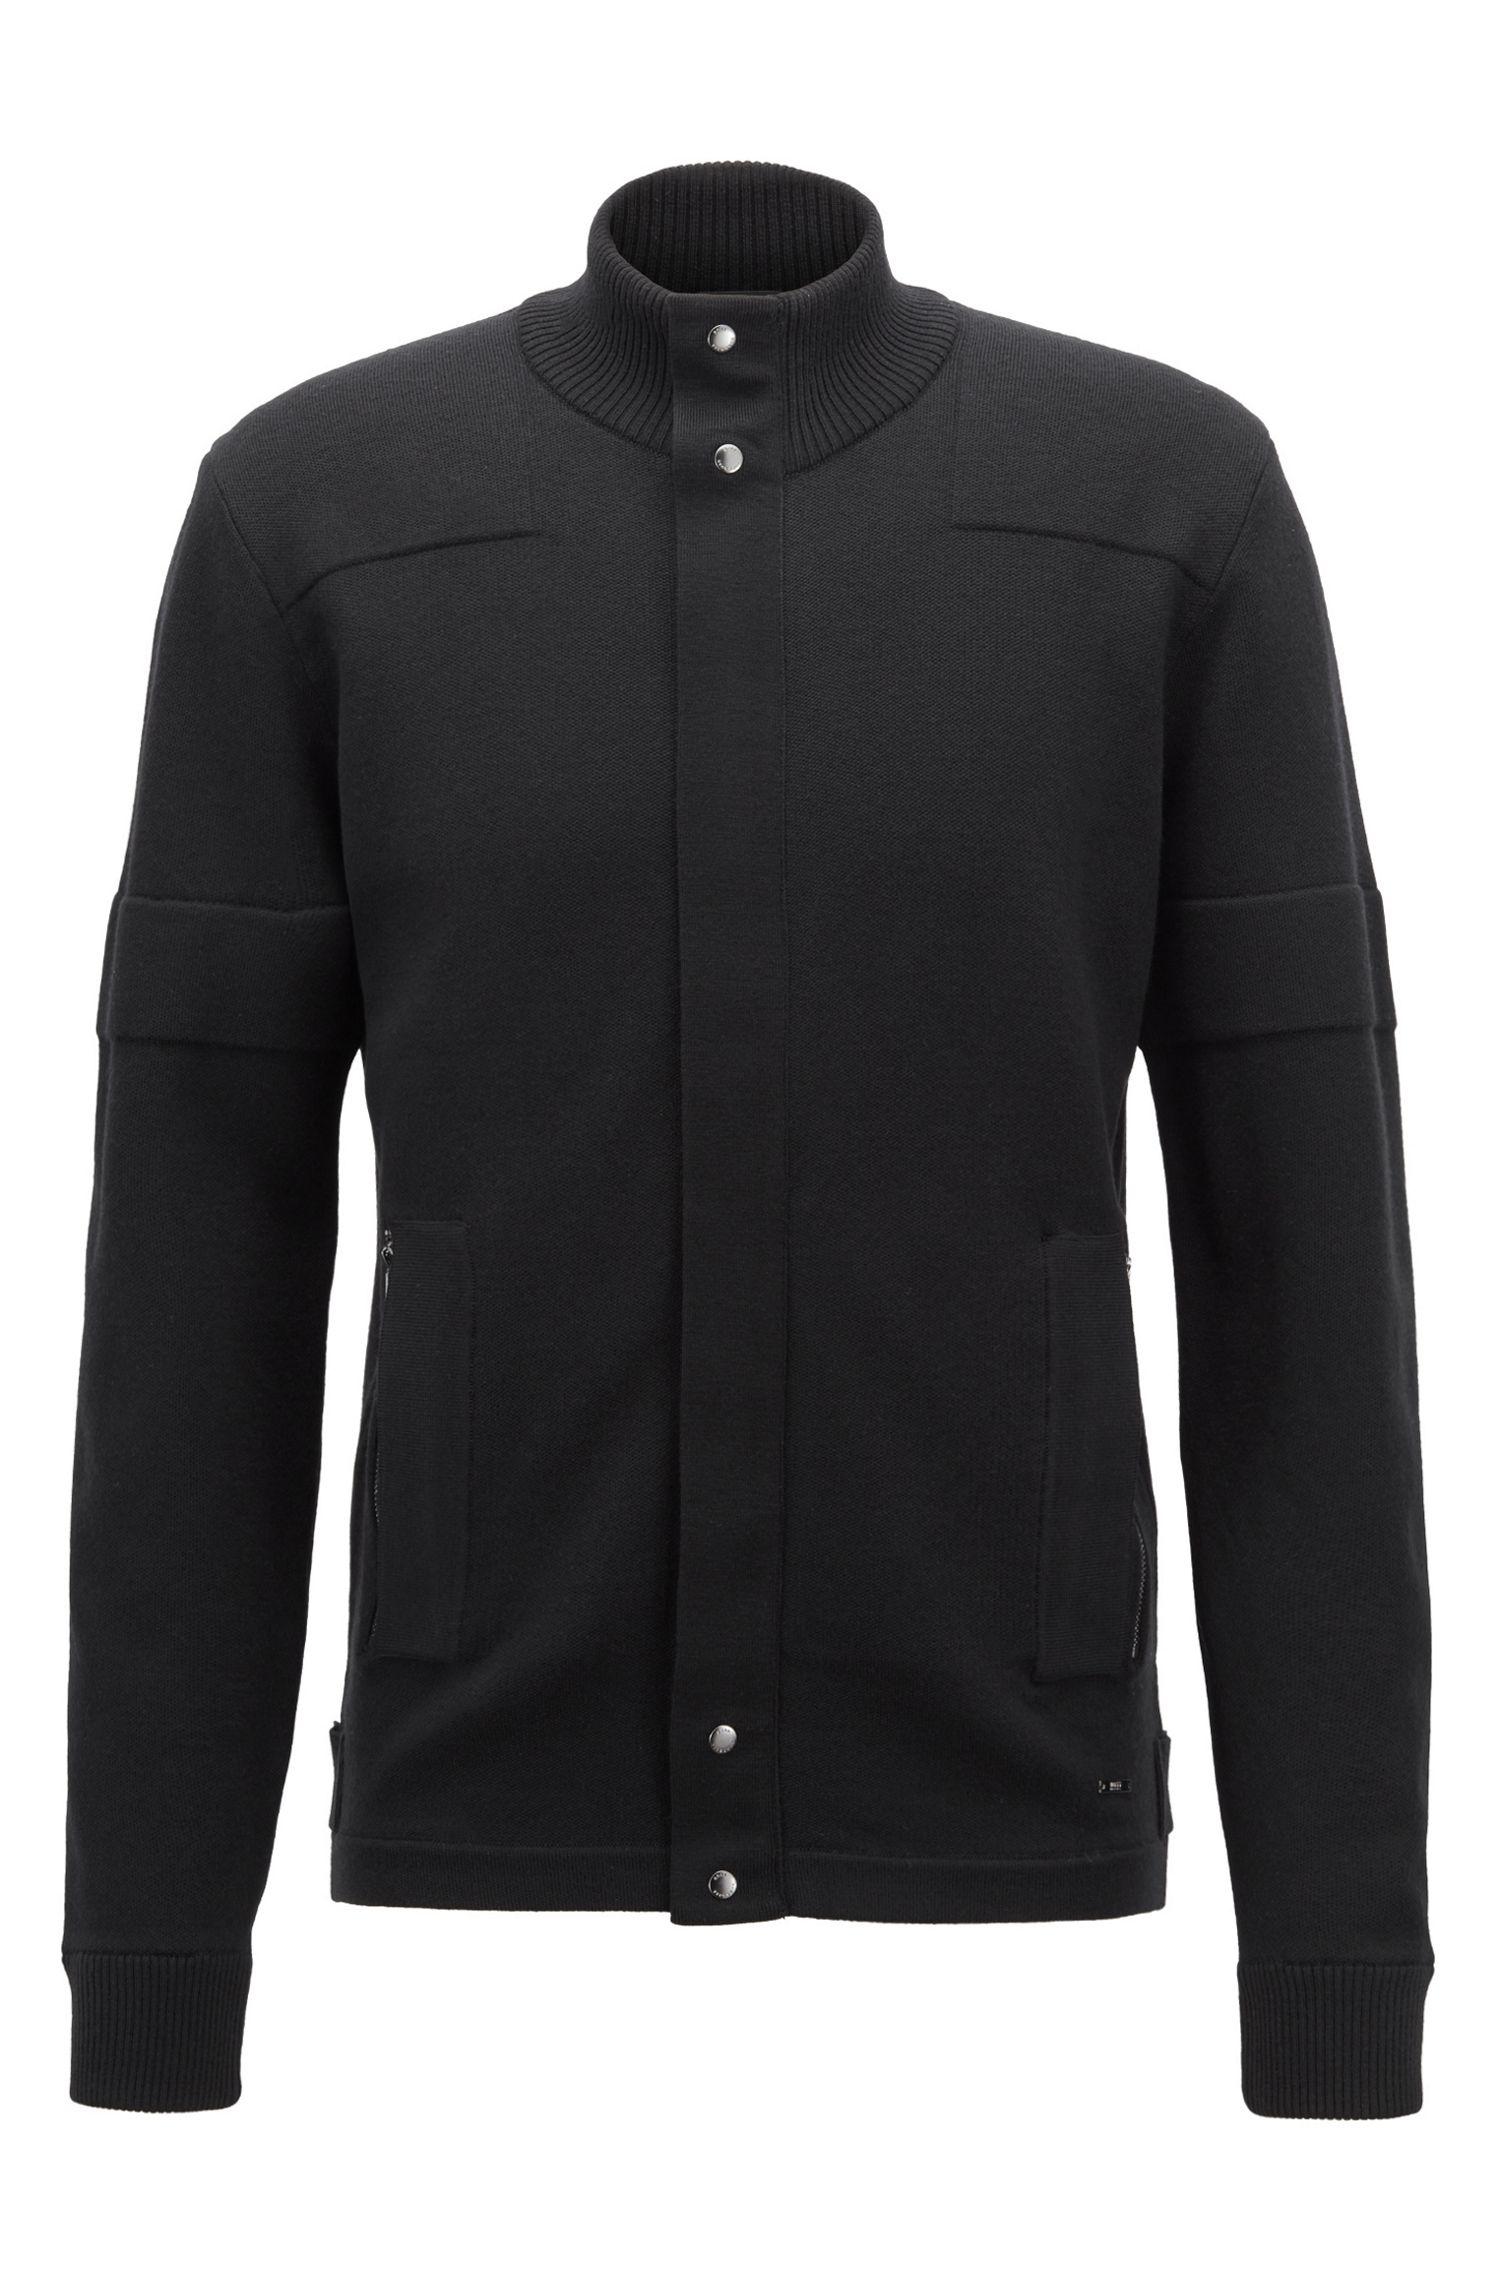 Biker-inspired knitted cardigan in Italian merino wool, Black